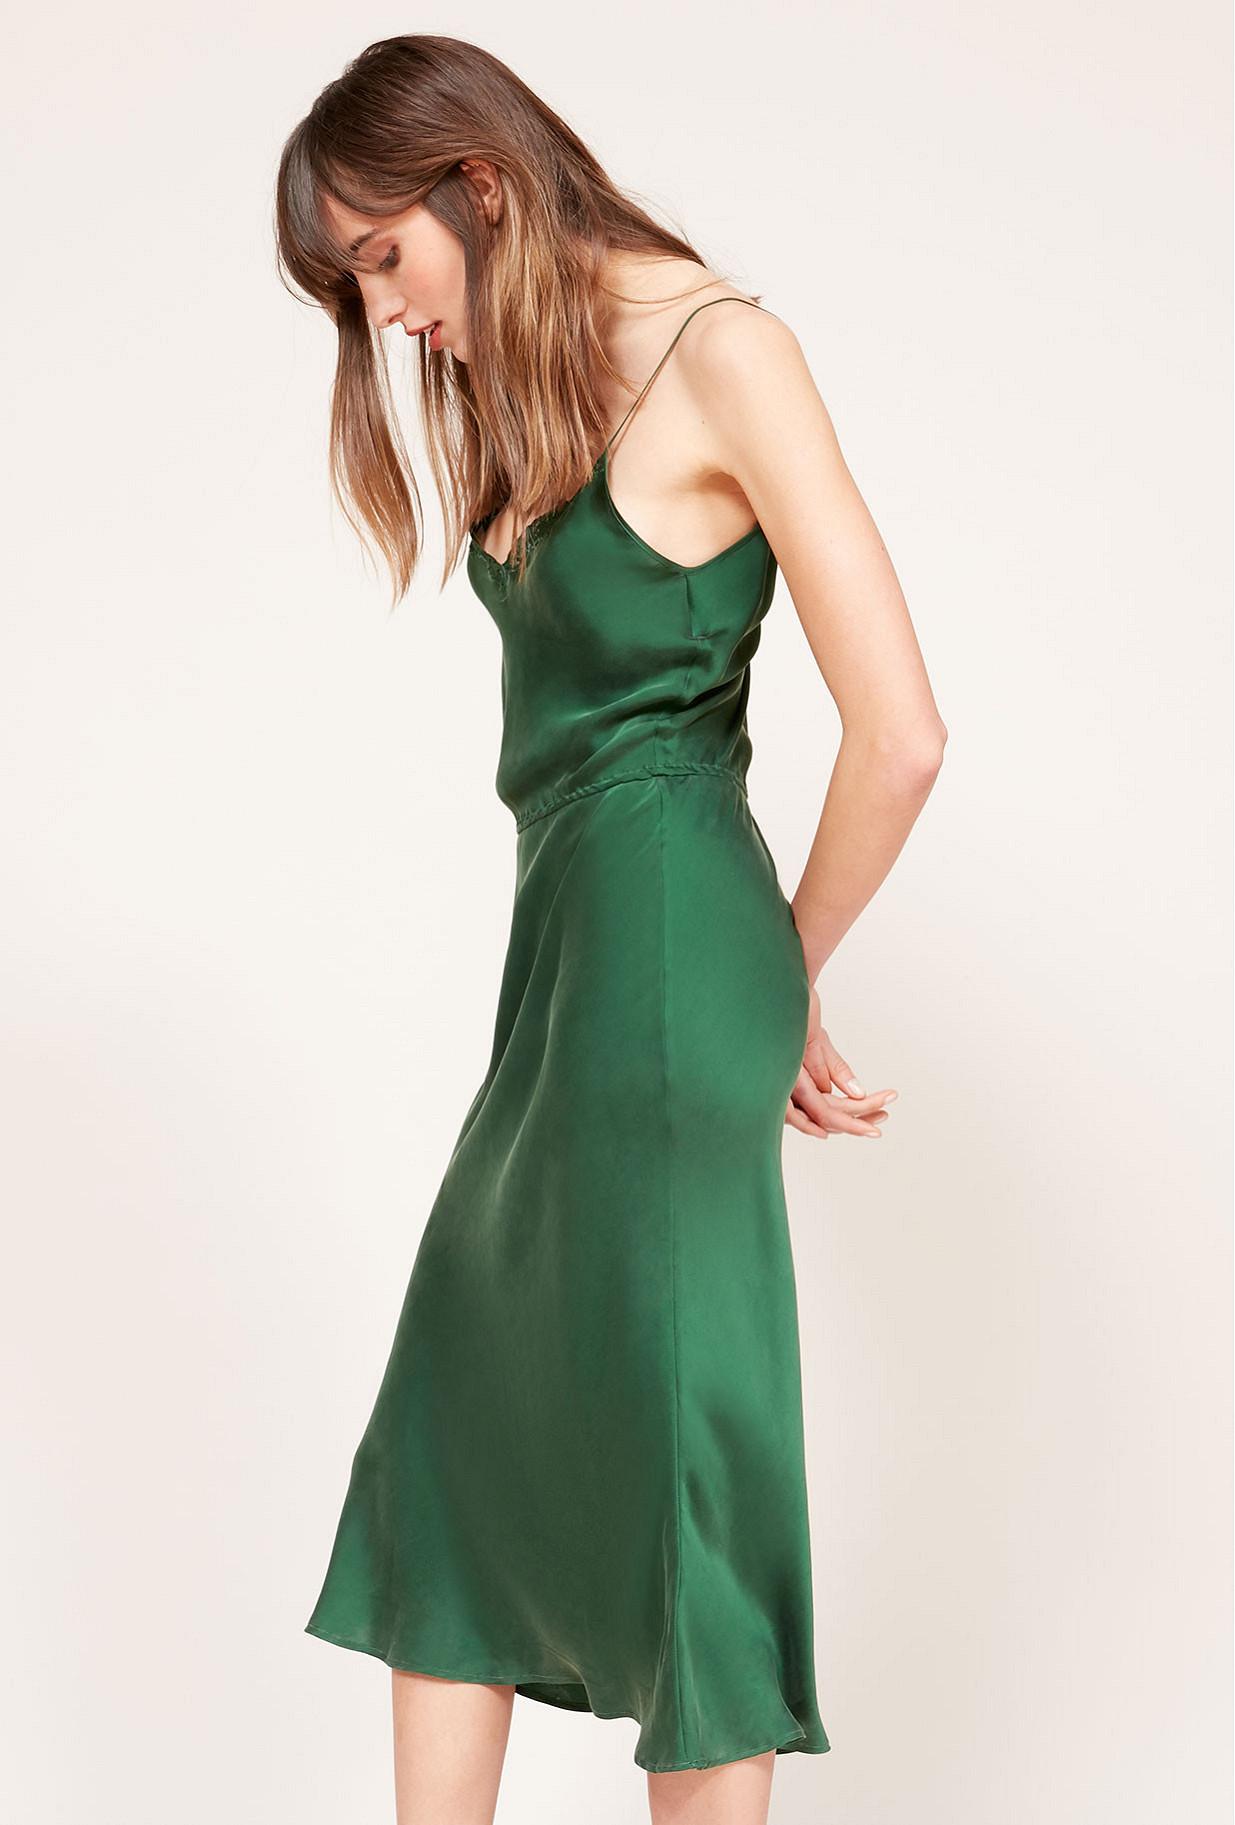 Green  Dress  Ana Mes demoiselles fashion clothes designer Paris